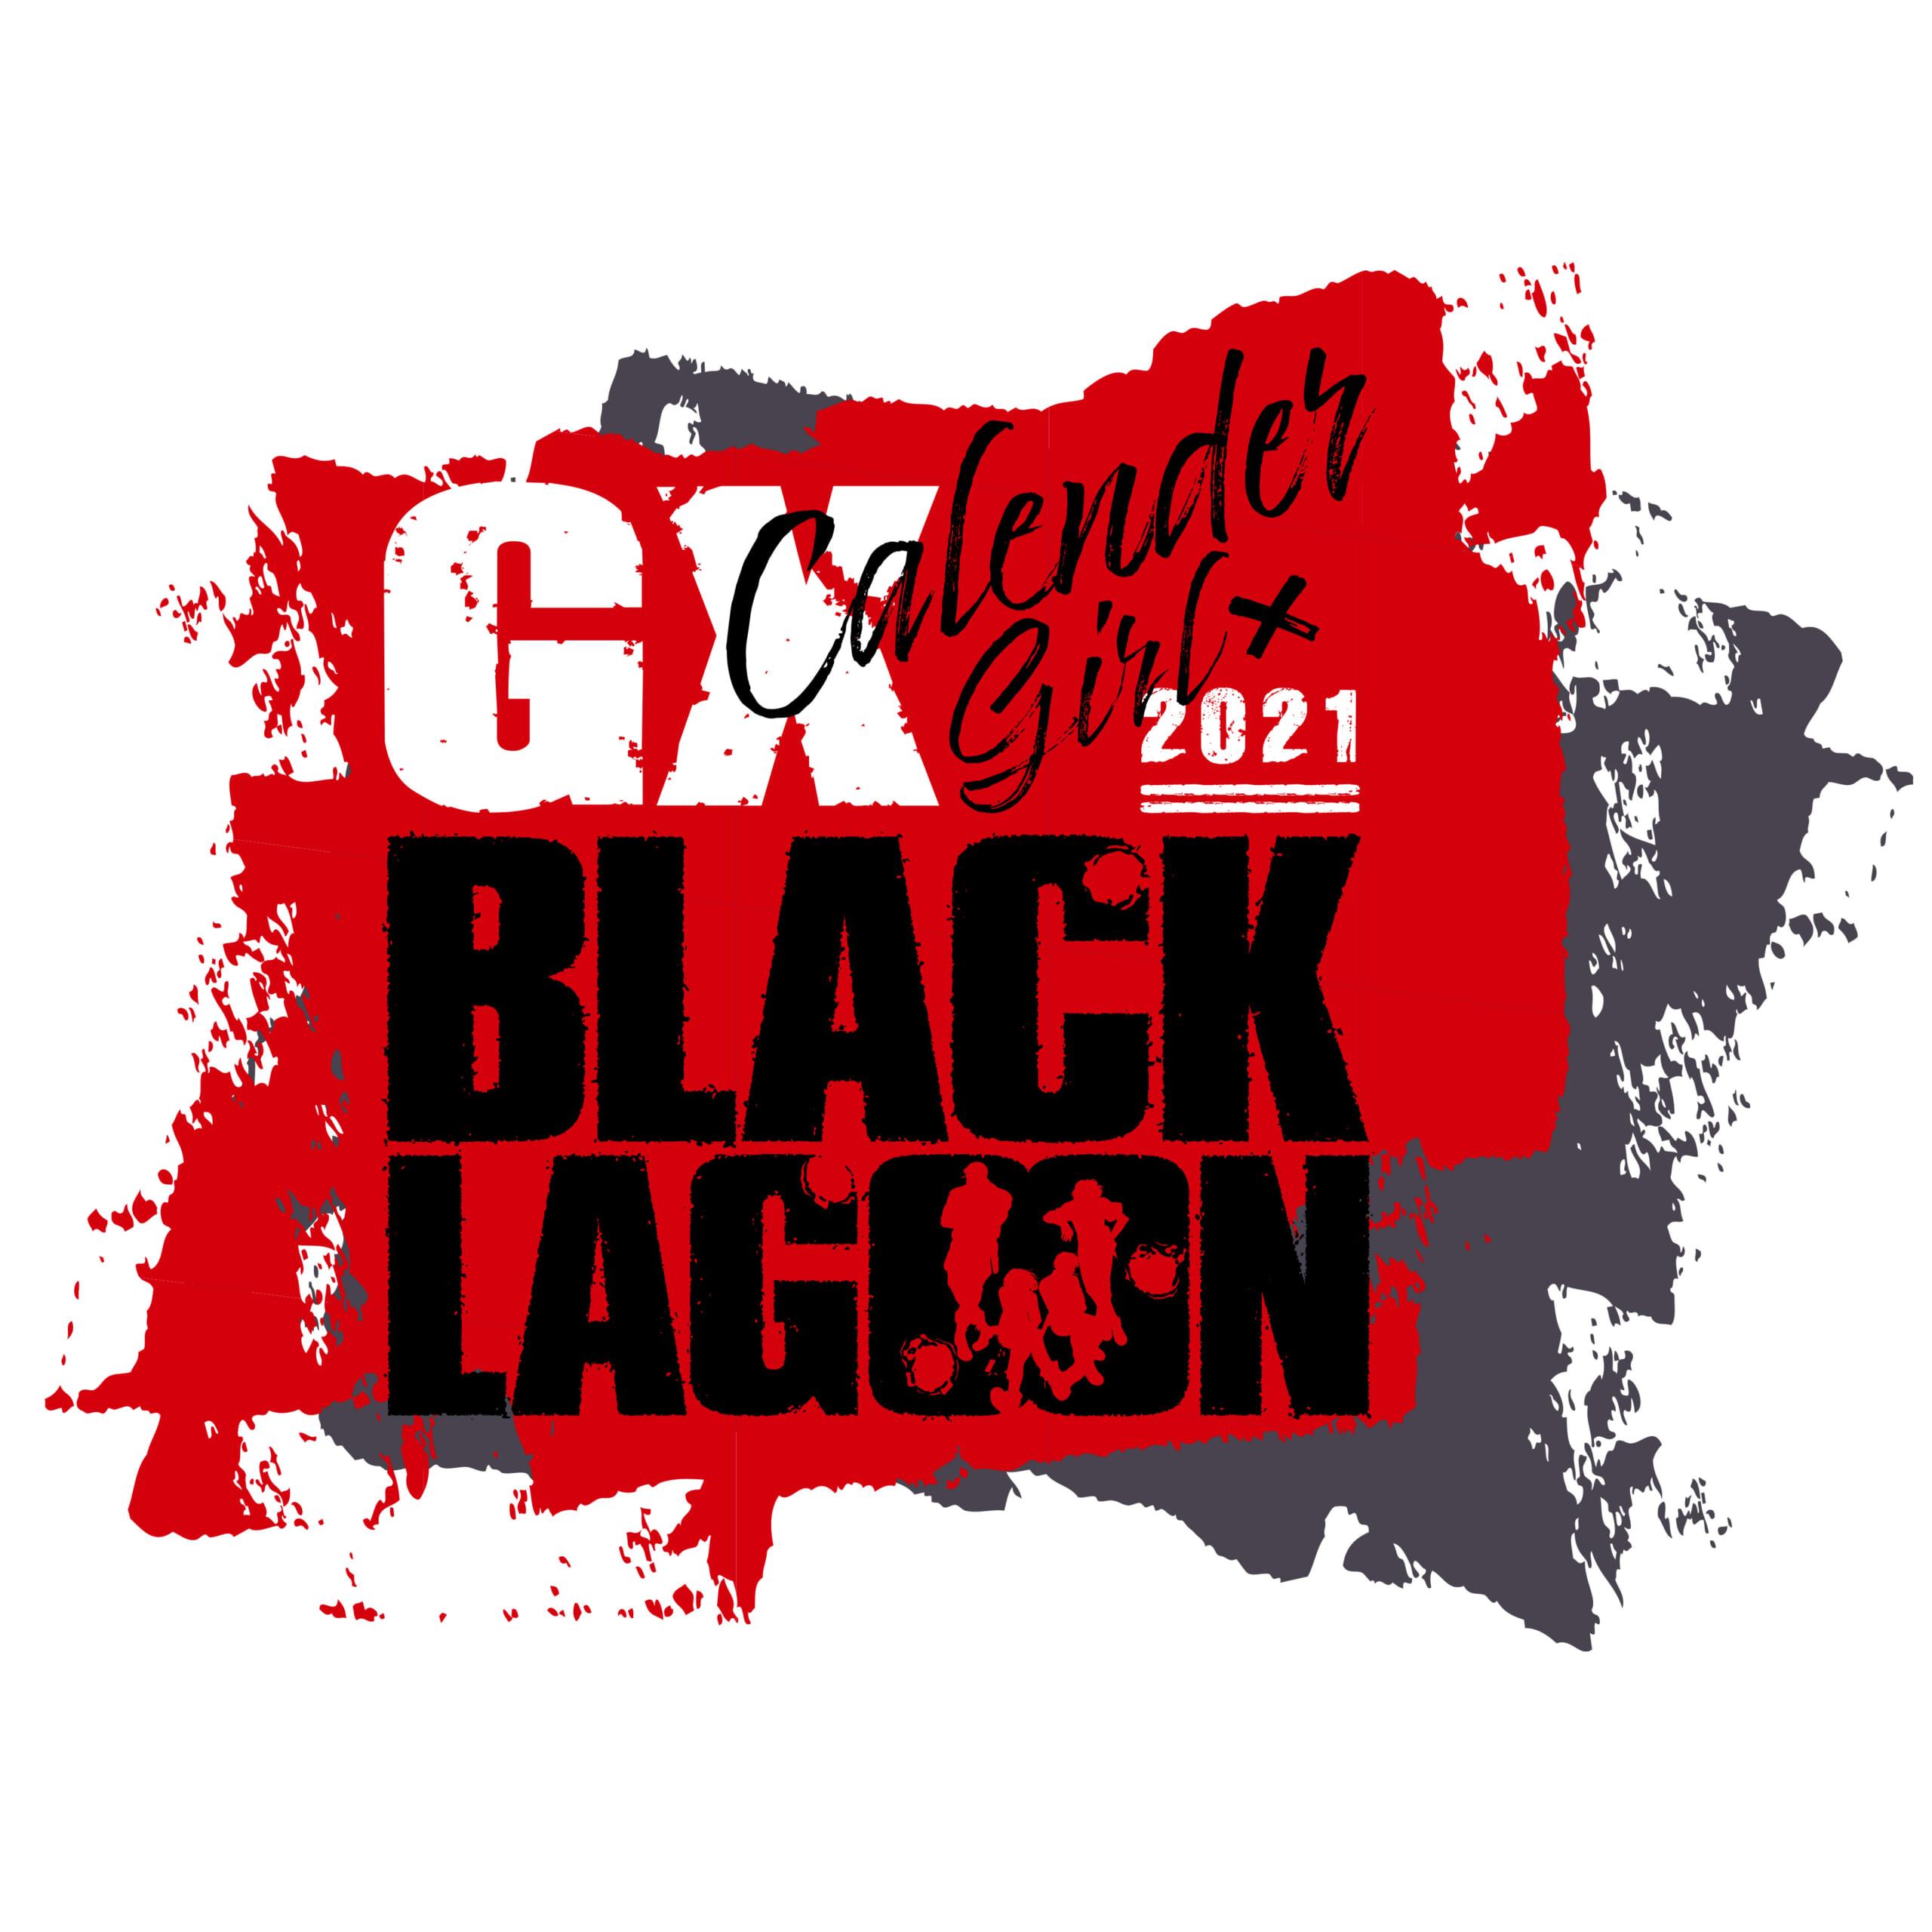 「GXカレンダーガール×BLACK LAGOON」豪華クリエーター続々登場!